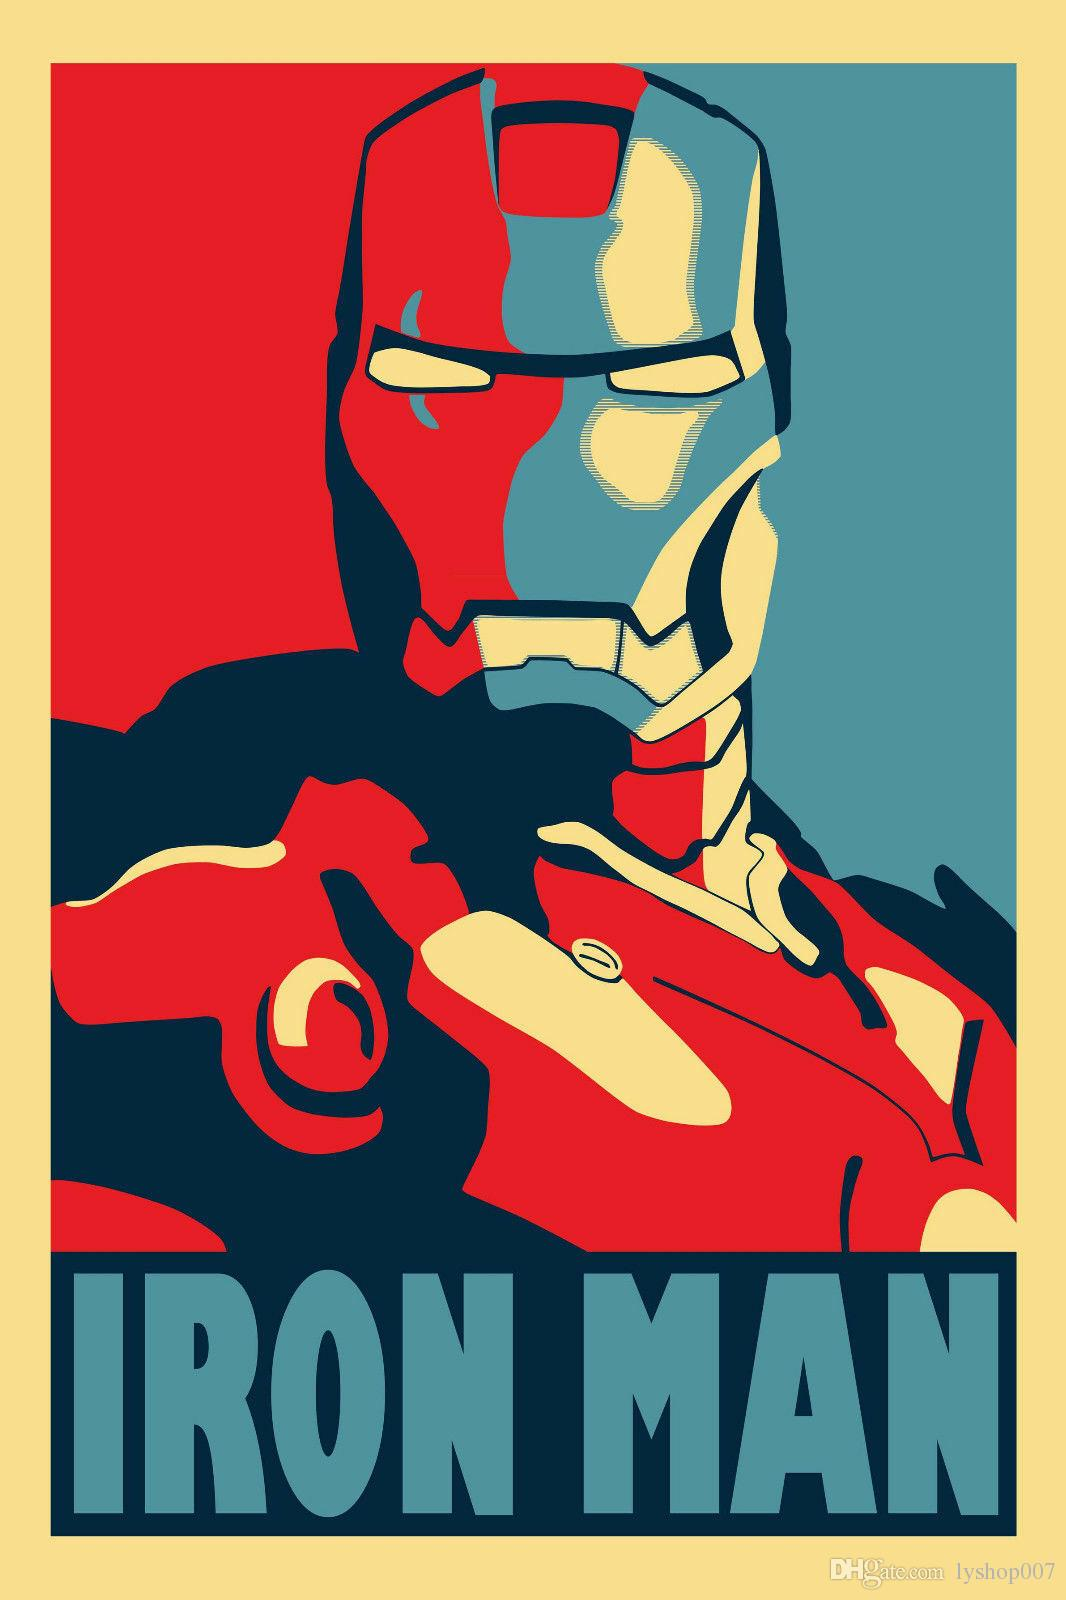 2019 Iron Man Movie Wall Decor Art Silk Print Poster 888 From Lyshop007 Price Dhgate Com